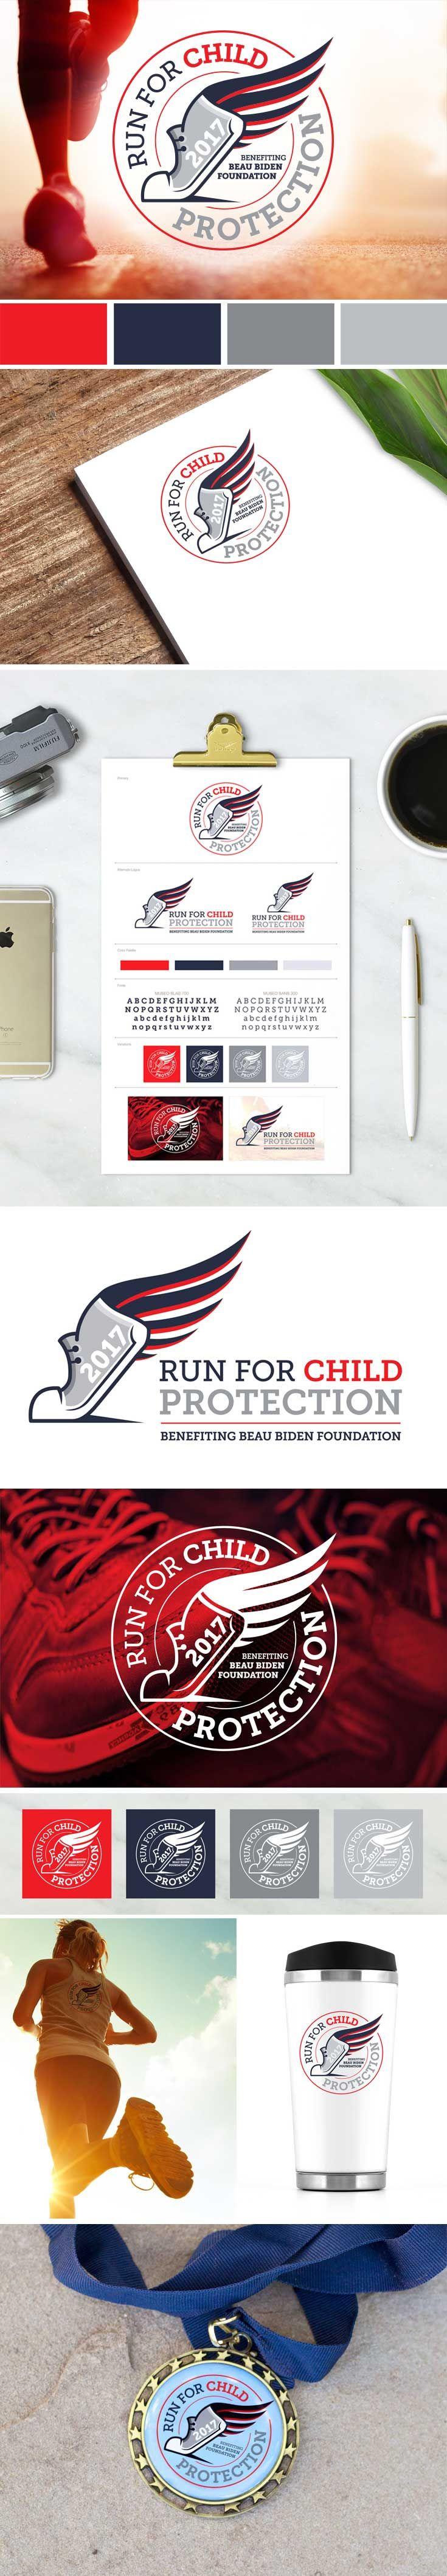 Beau Biden Foundation Run for Child Protection Event Logo Fundraiser Branding